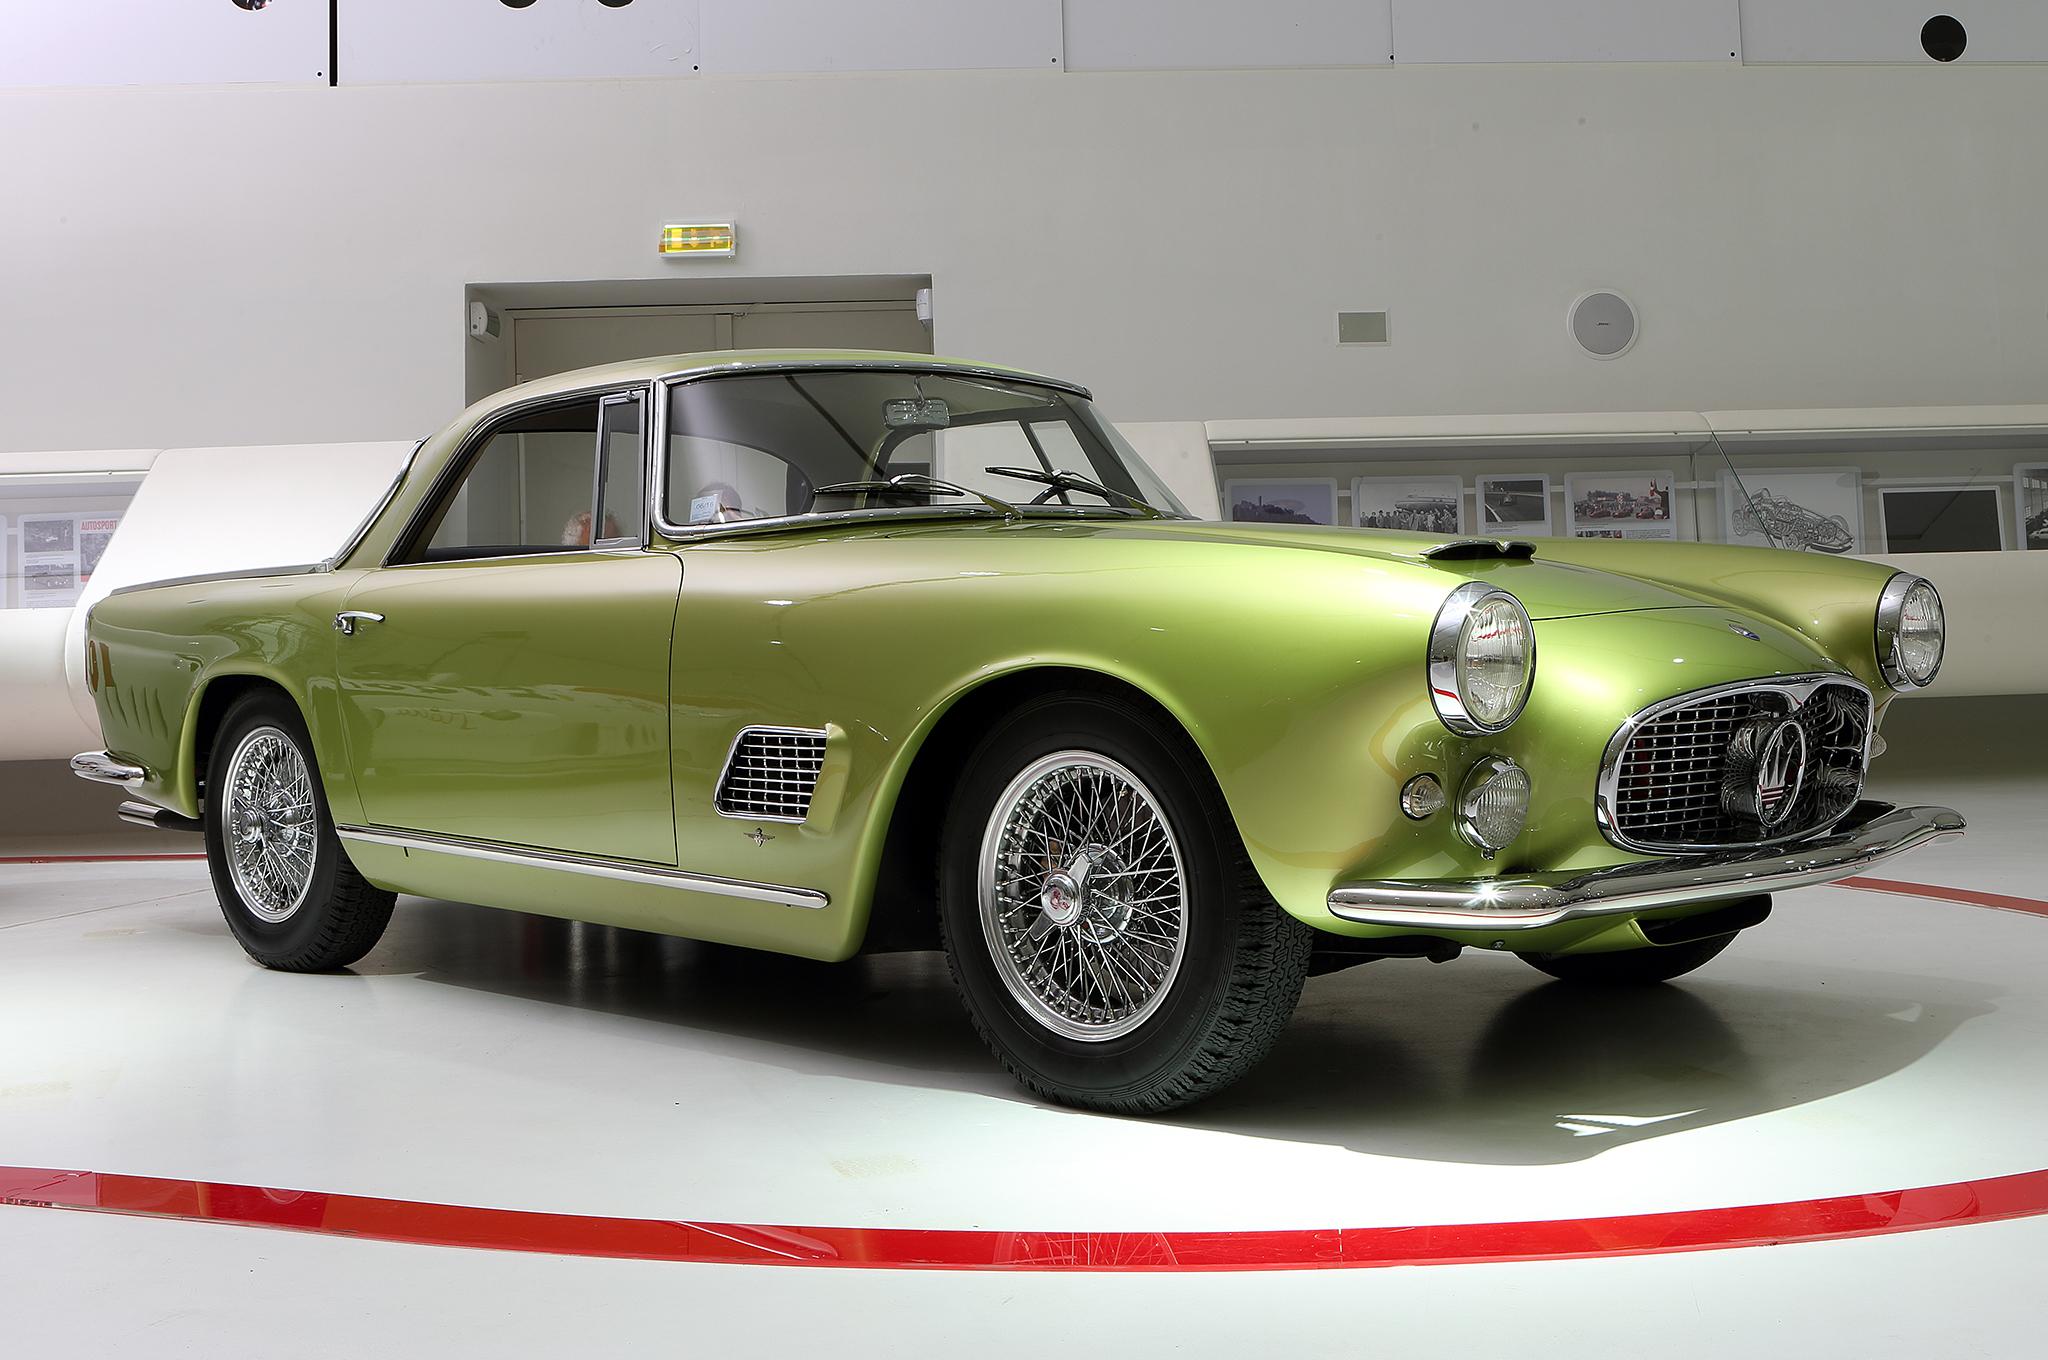 60's - Maserati 3500 GT (1957-1964)